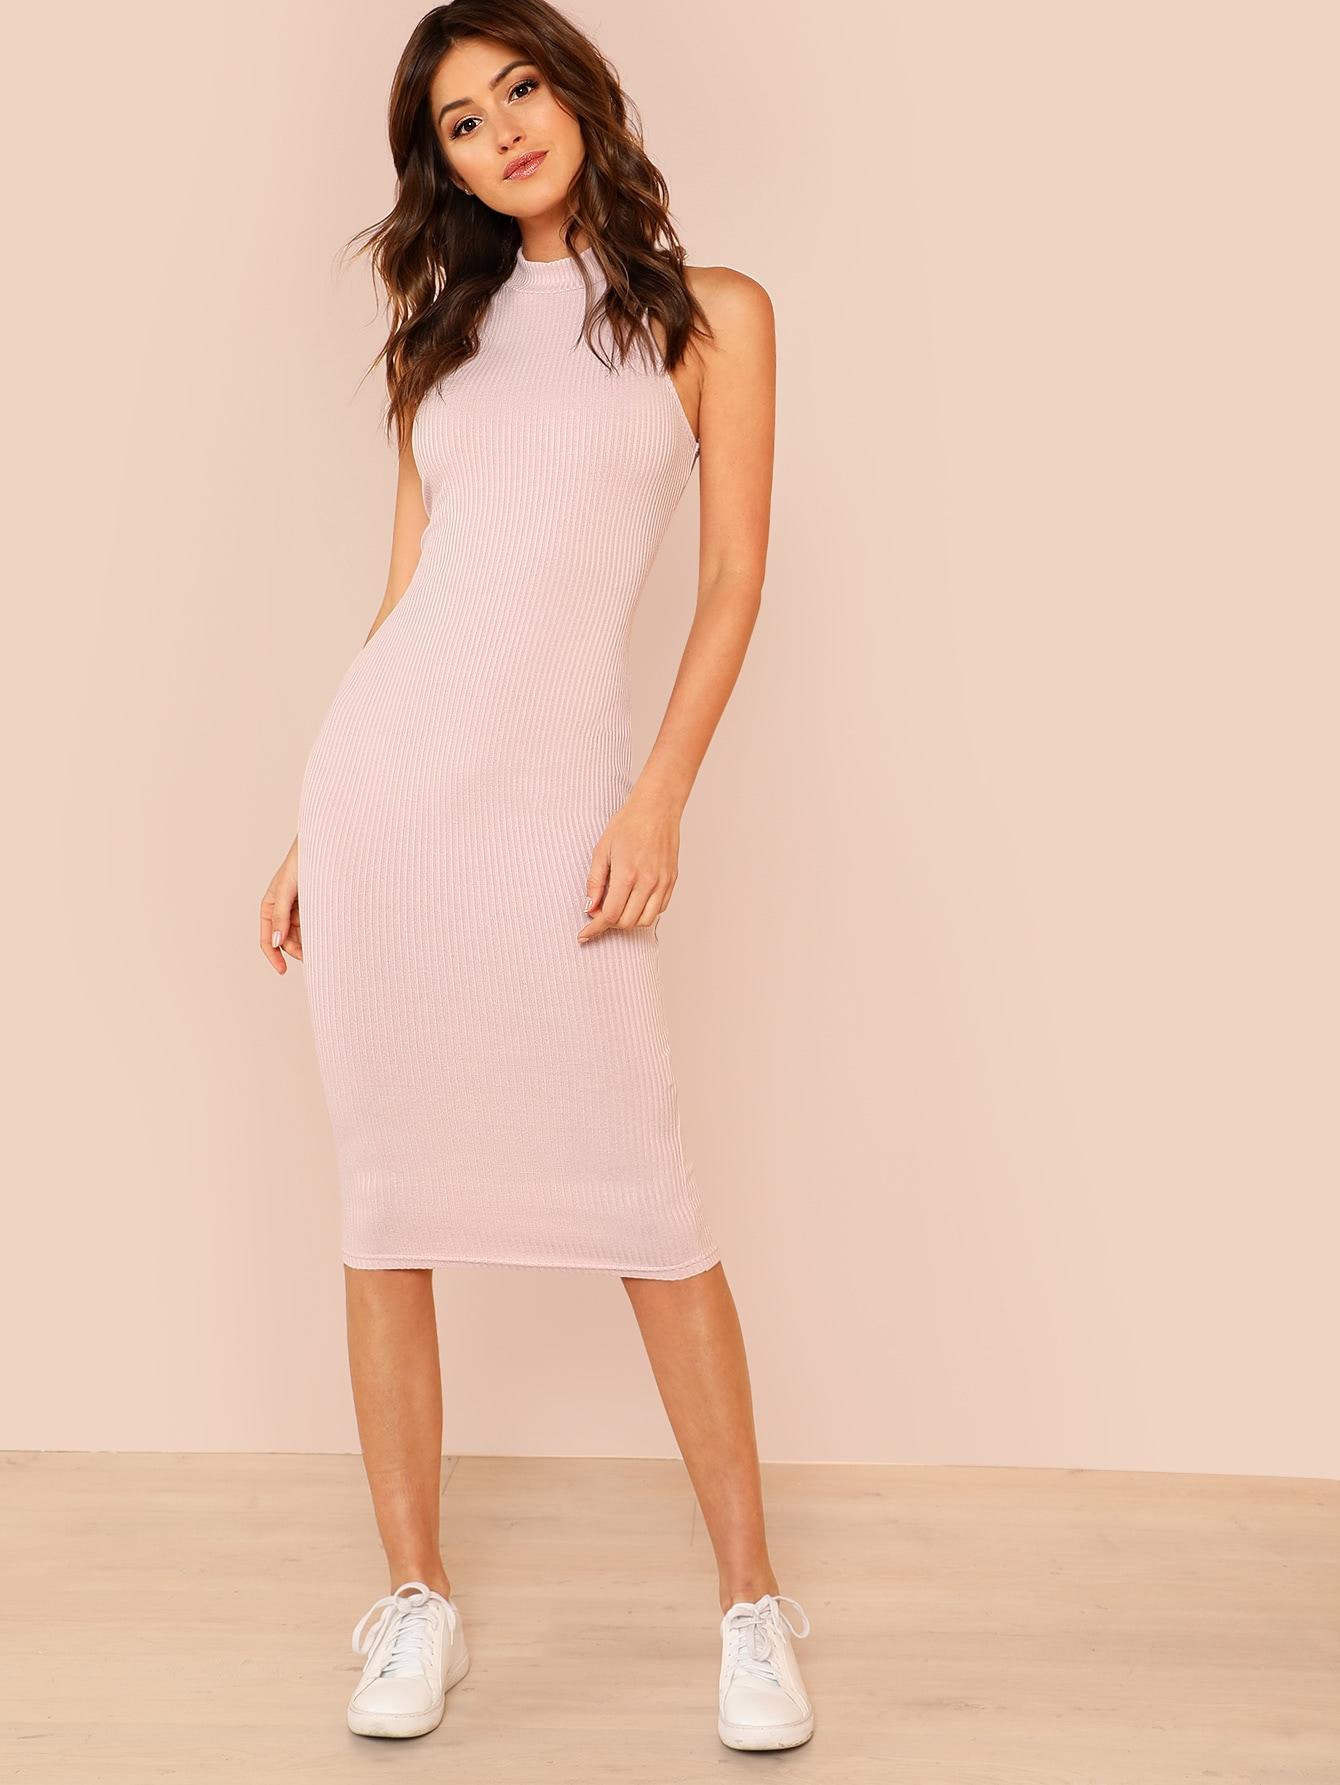 Mock Neck Rib Knit Pencil Dress mock neck lace up rib knit dress